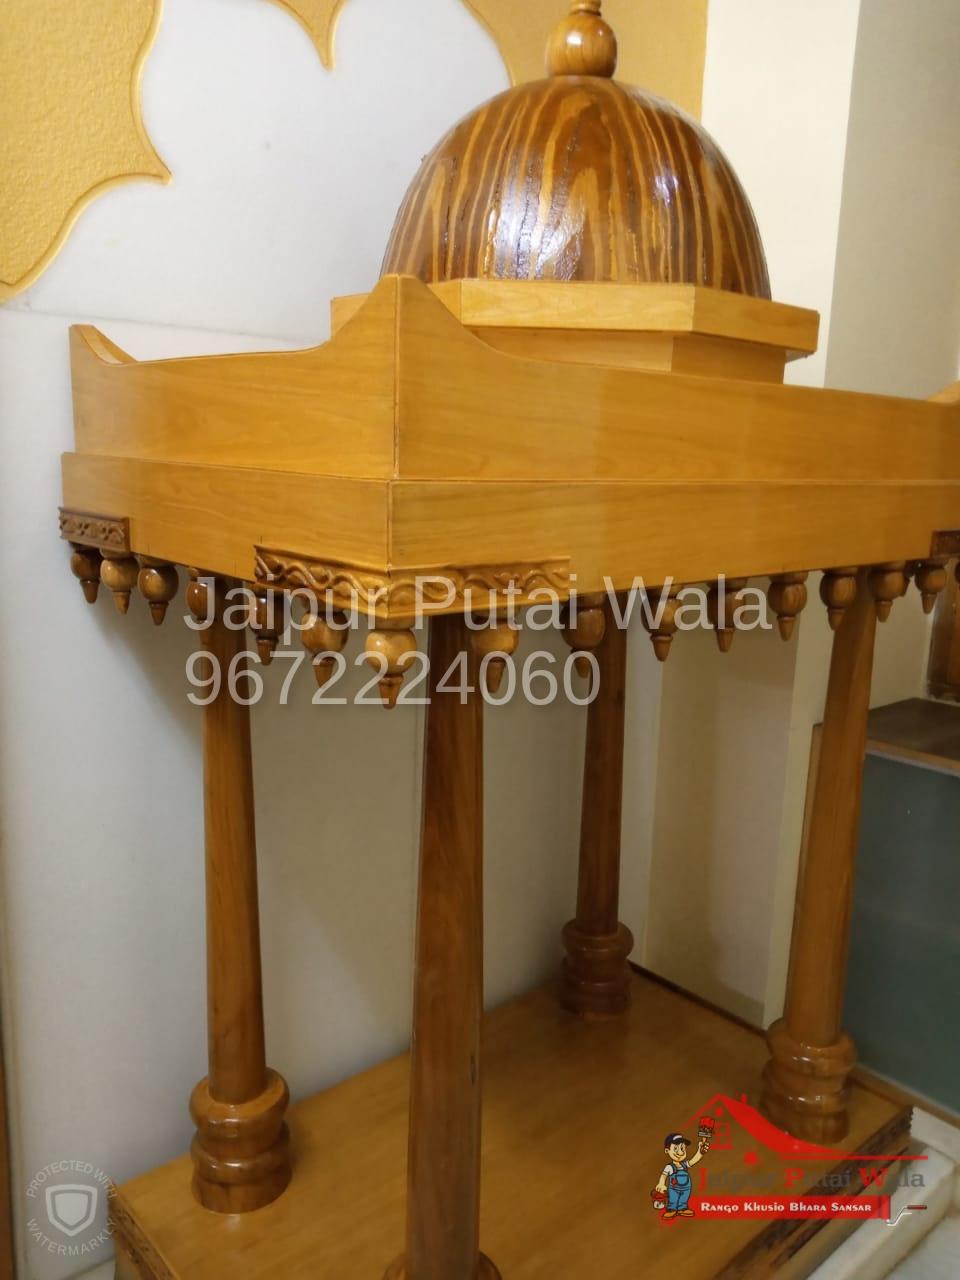 melamine-glossy-veneer-jaipur-wood-polish-8.jpeg